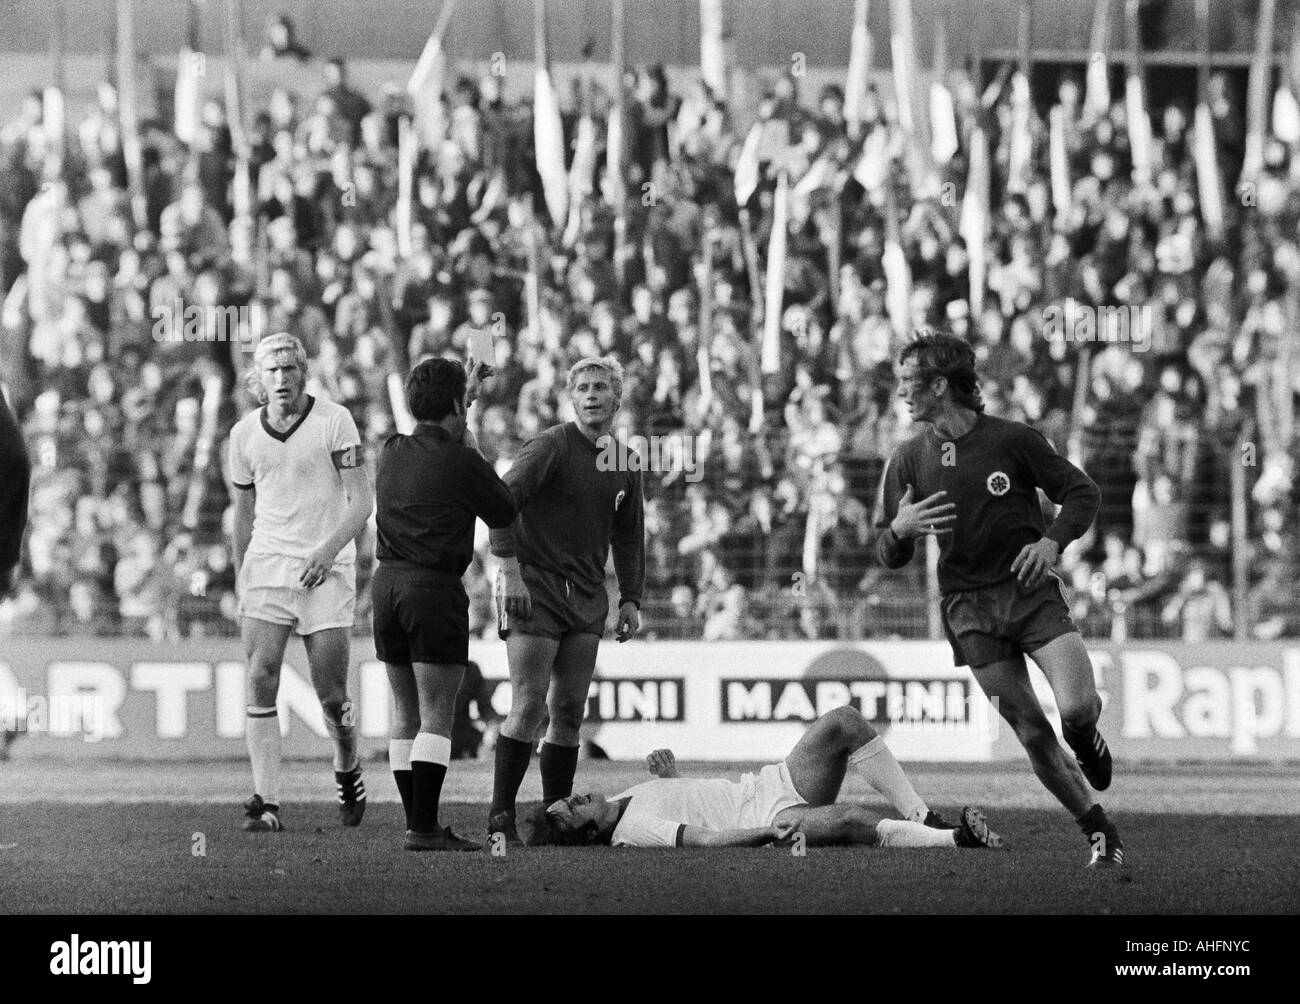 football, Bundesliga, 1972/1973, FC Schalke 04 versus Rot-Weiss Oberhausen 3:0, Glueckaufkampfbahn Stadium in Gelsenkirchen, scene of the match, f.l.t.r. Rolf Ruessmann (S04), referee Dieter Berner from Enzberg yellow-cards Gert Froehlich (RWO), Peter Ehm - Stock Image